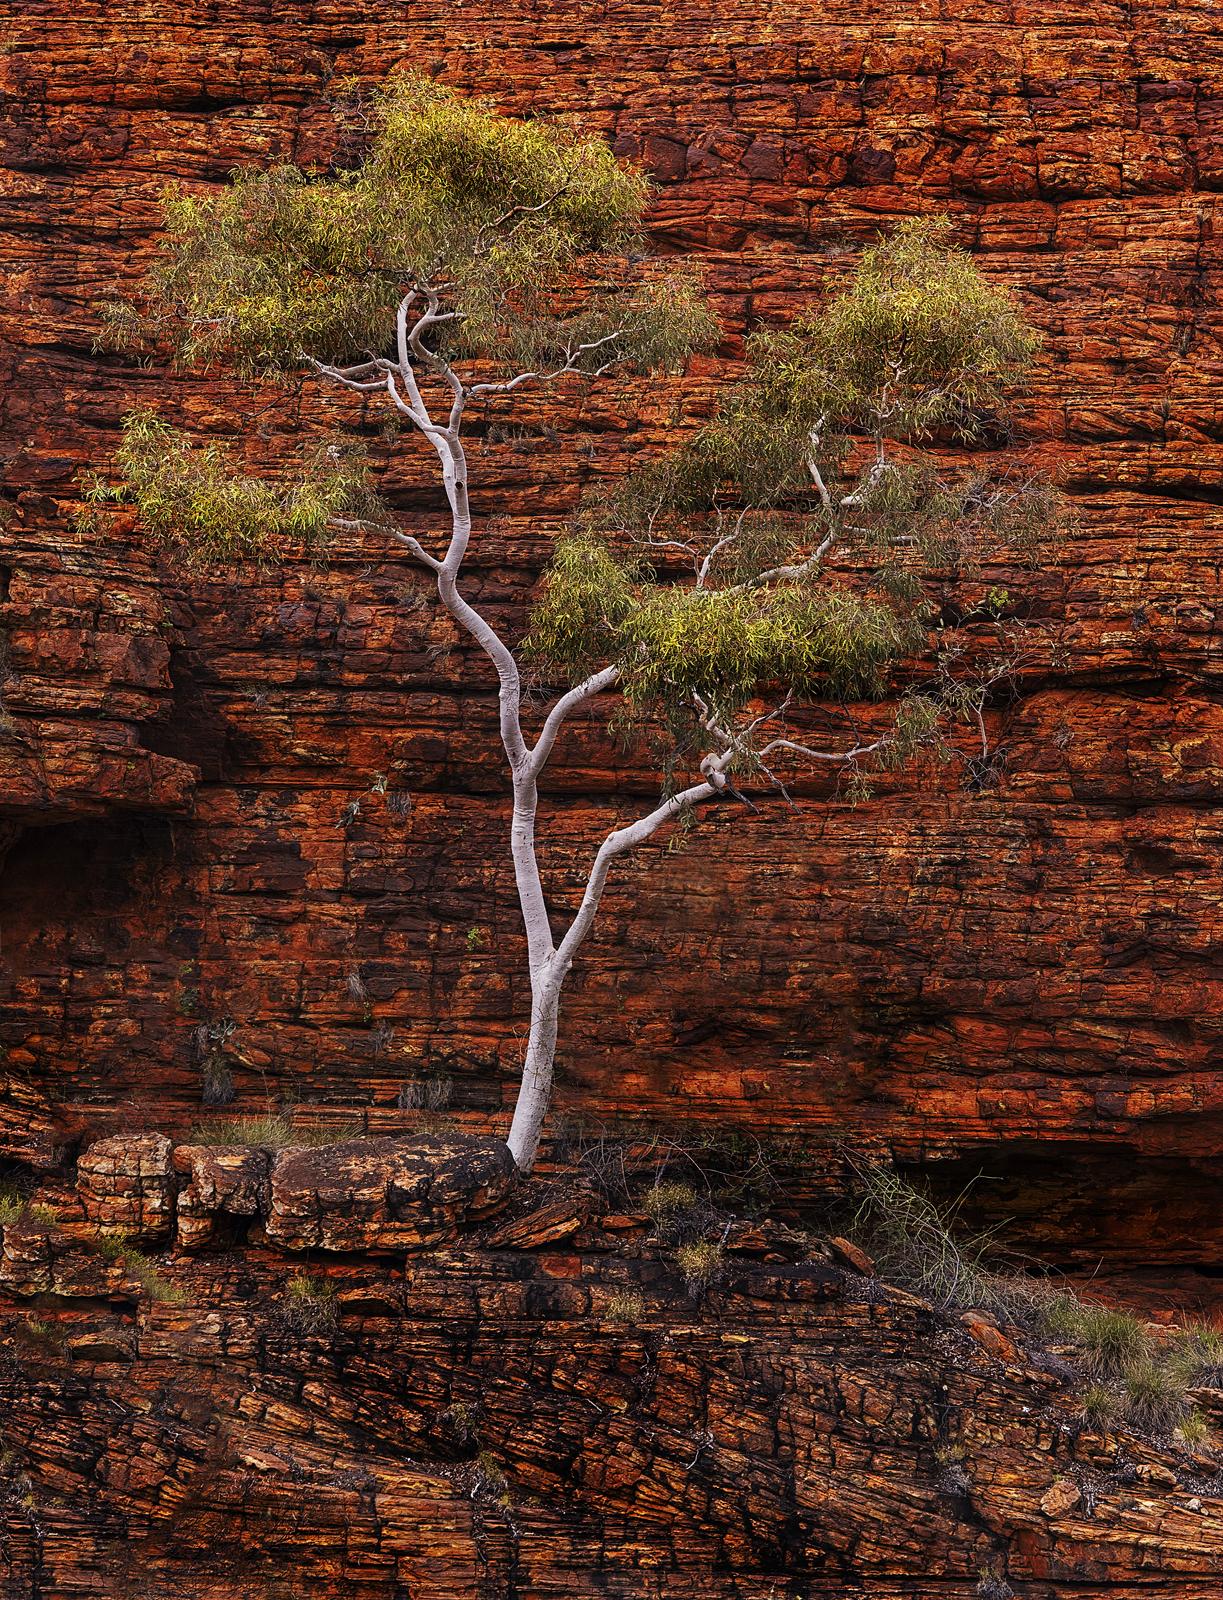 Kings Canyon Tree